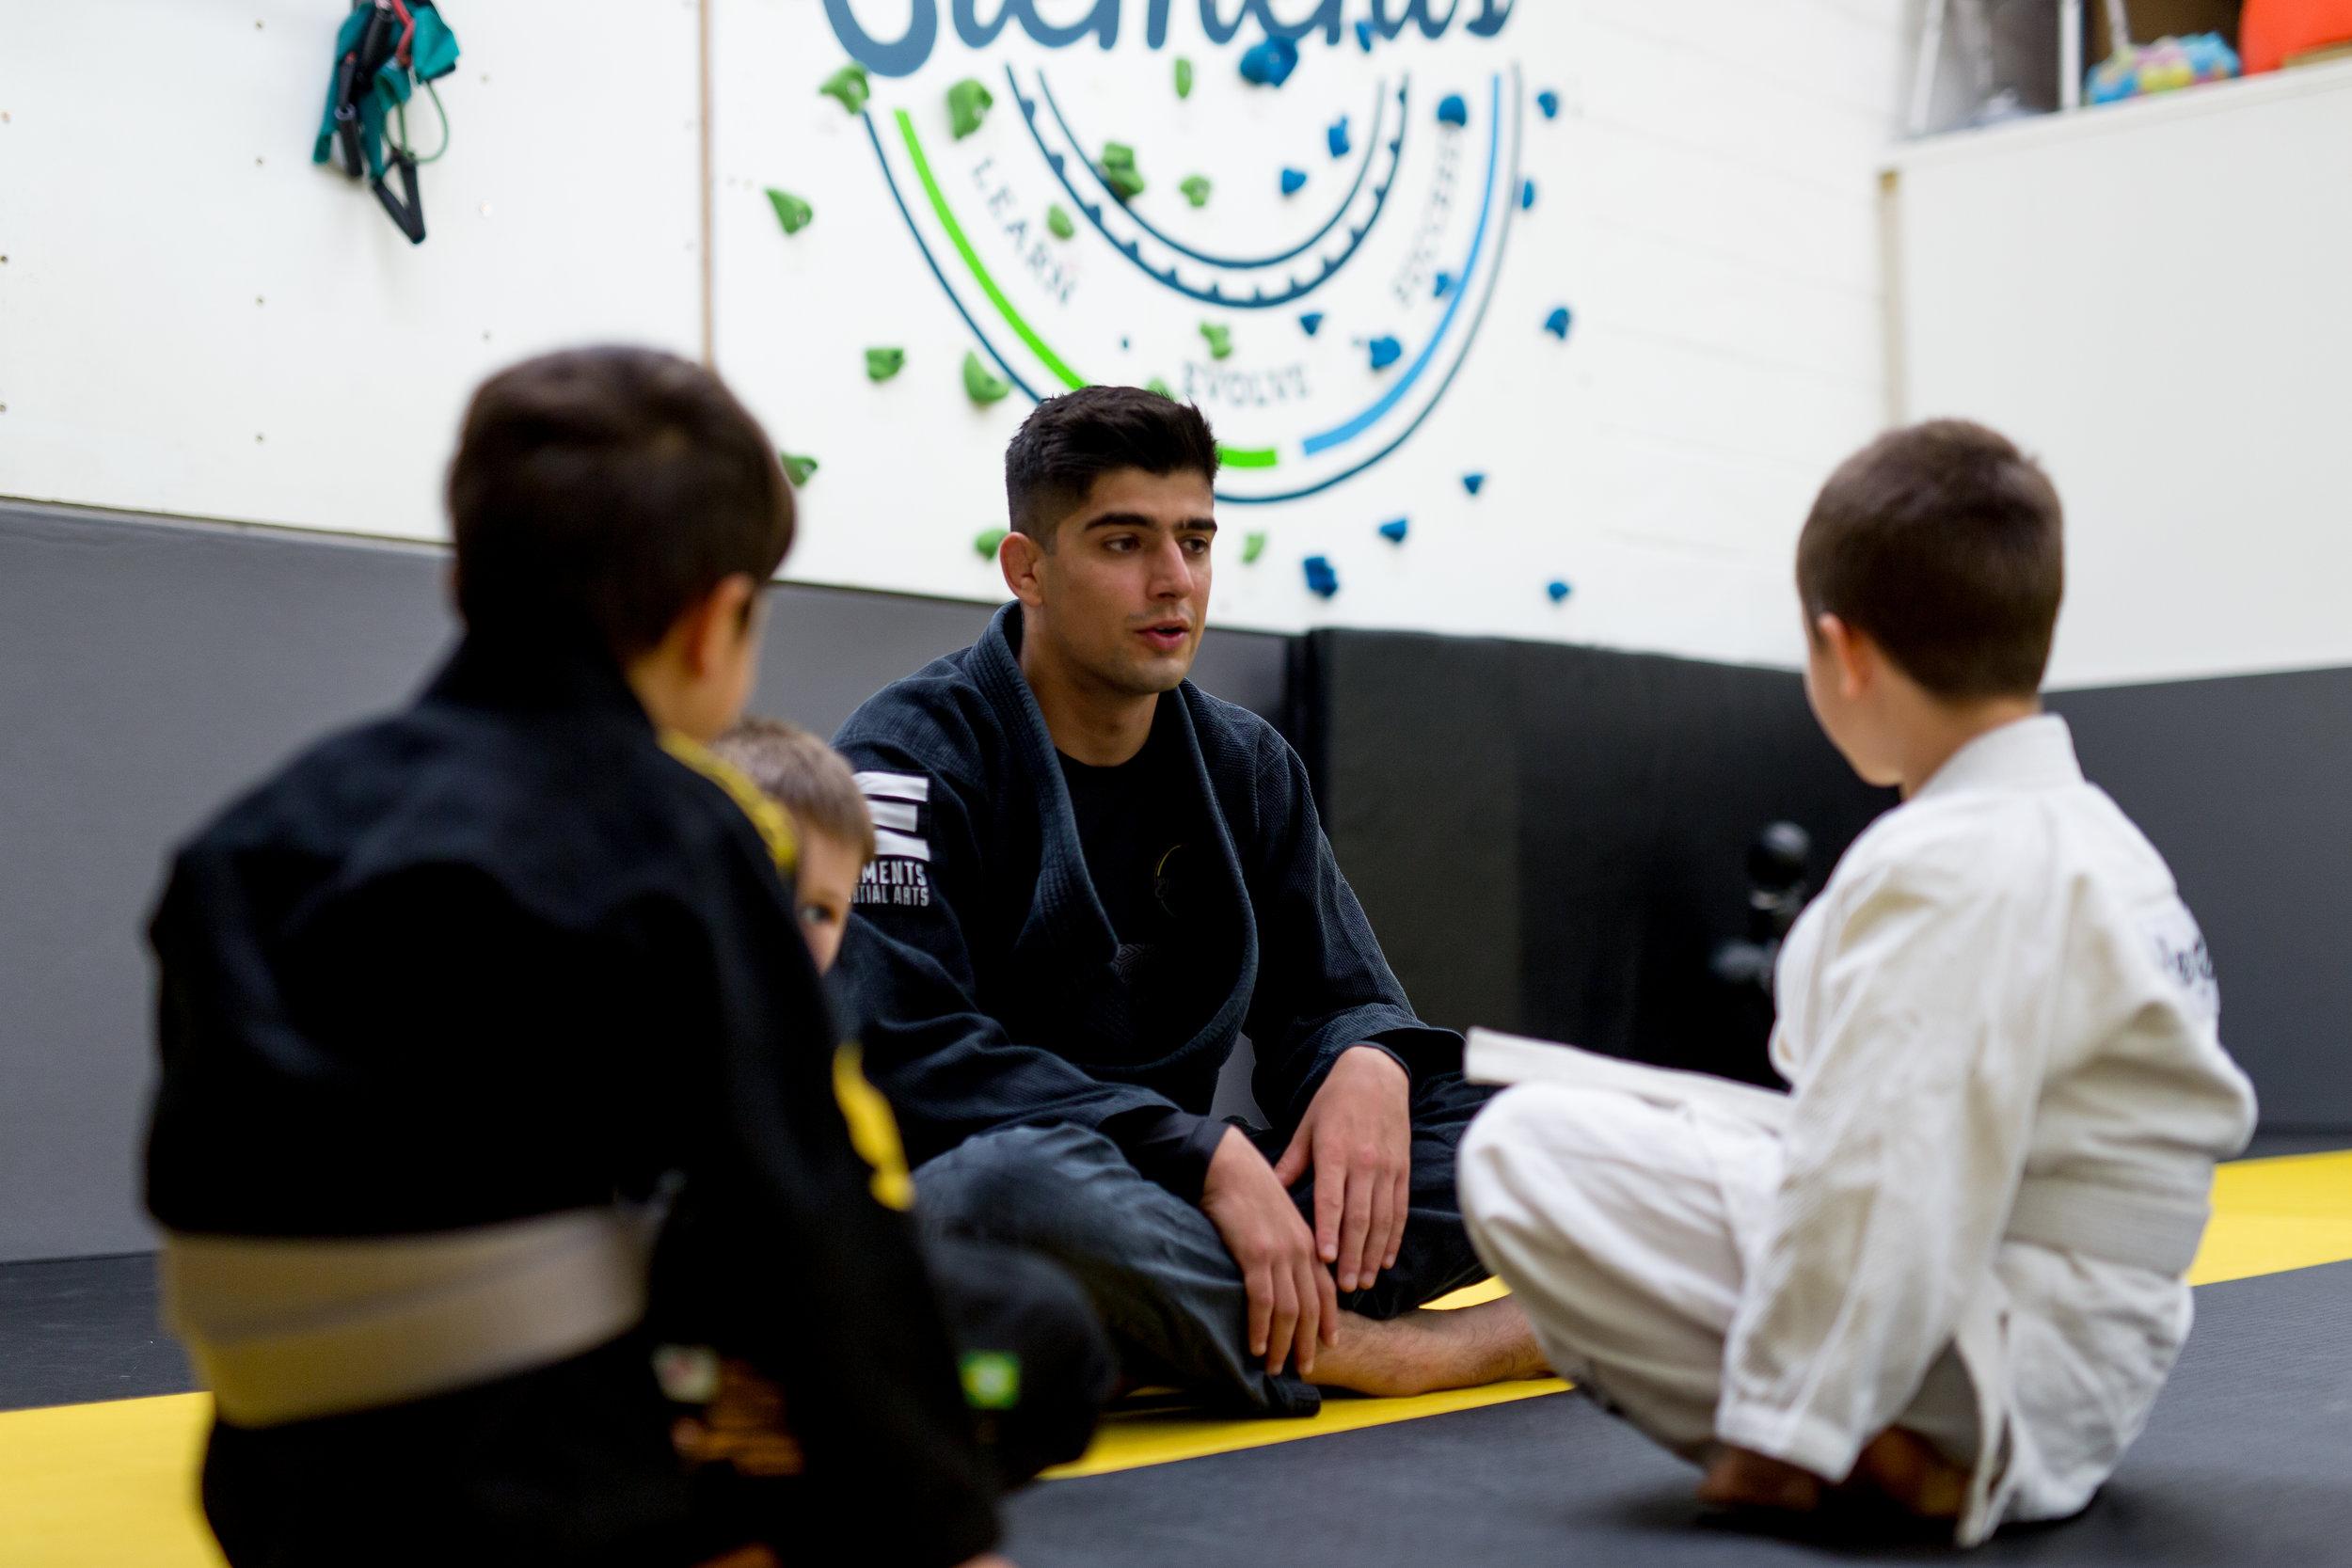 Elements martial arts kids lewes